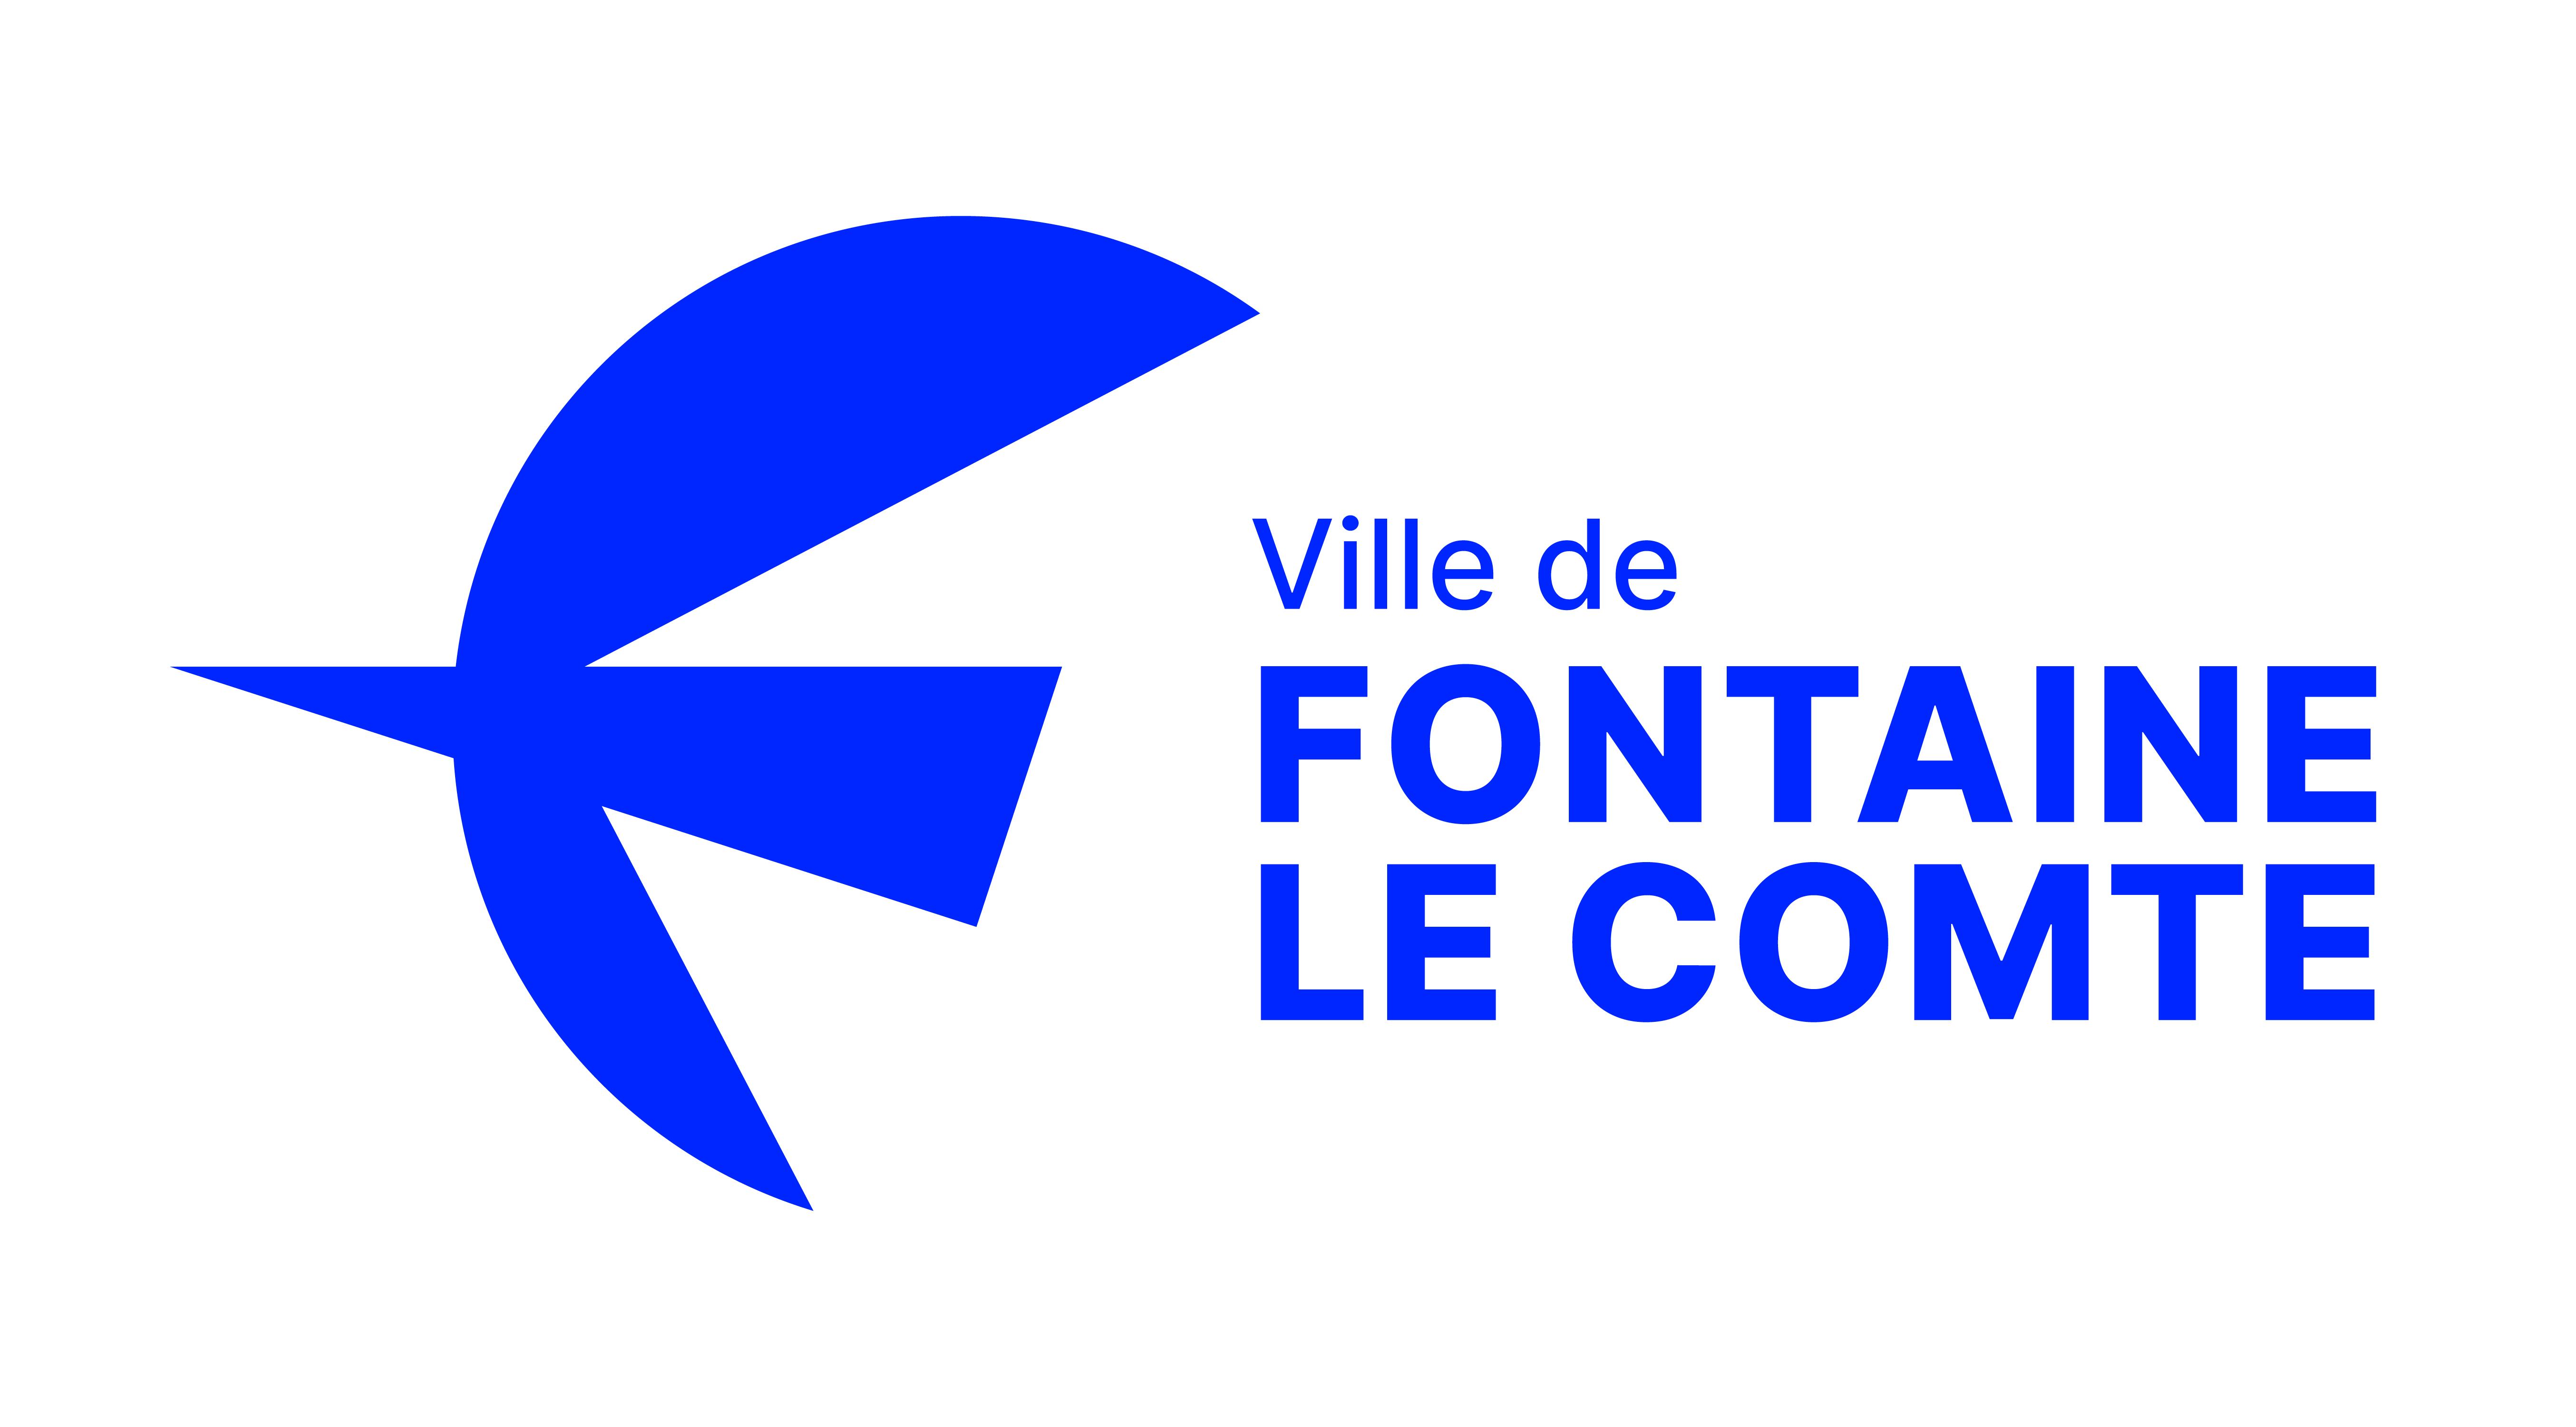 Fontaine_le_comte_CMJN_Logotype_horizontal-bleu